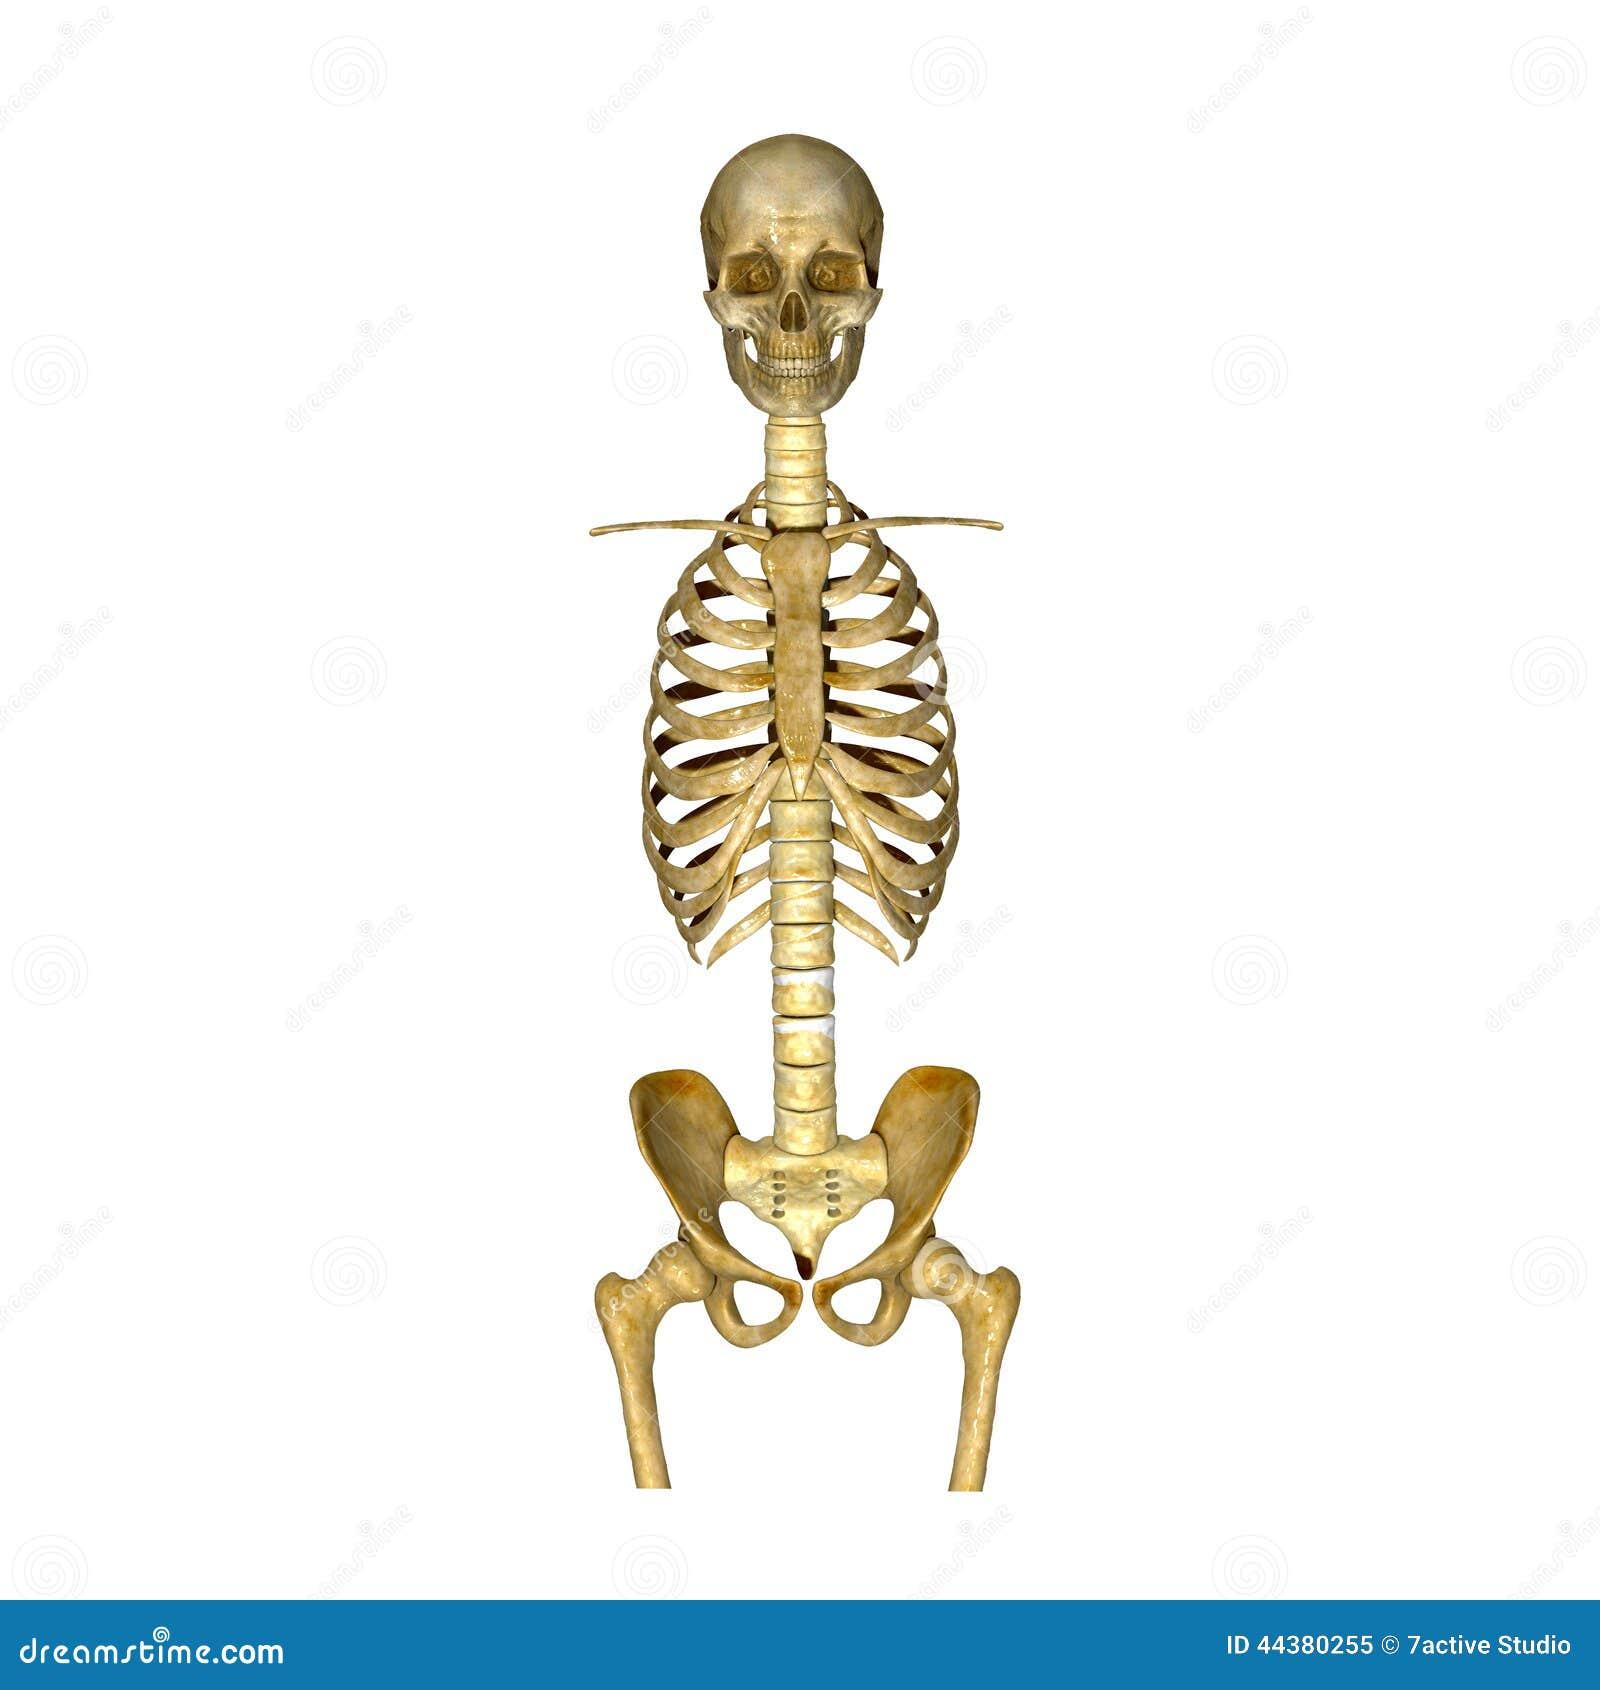 Skeletonskullribsbackbone And Hip Bone Stock Image Image Of